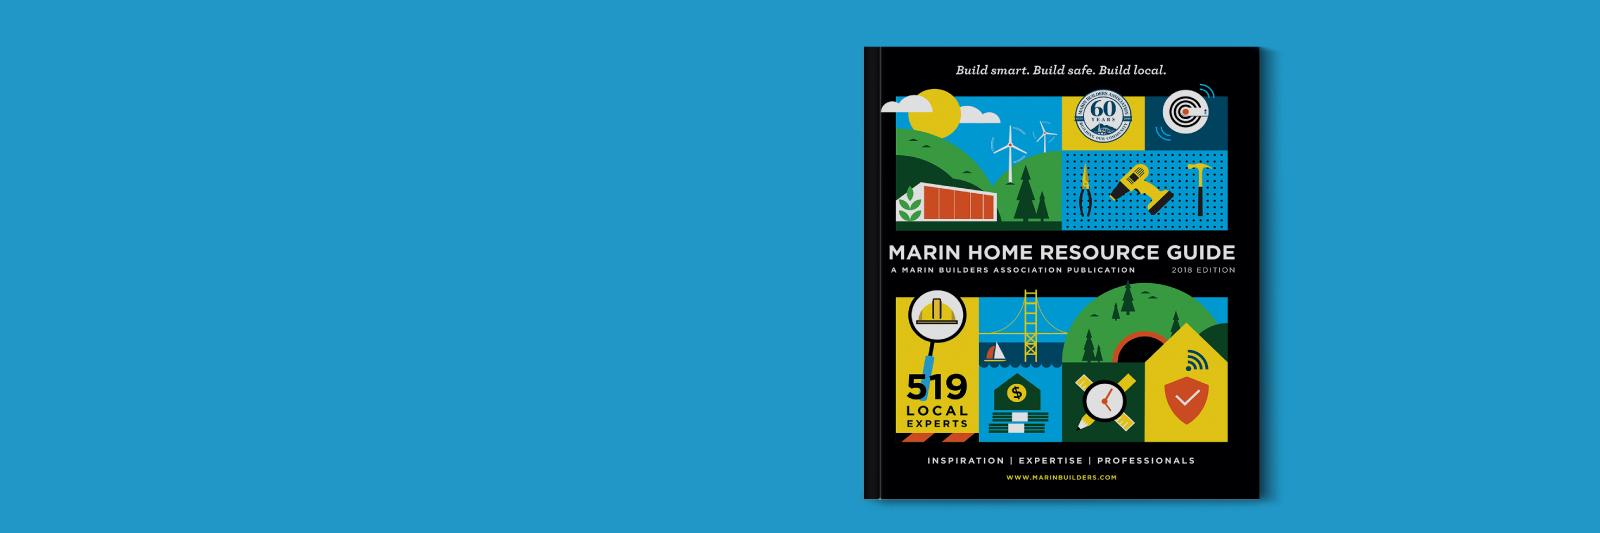 Marin-Builders-marinbuilders.com-Home-Page-Slider-MHRG18.jpg